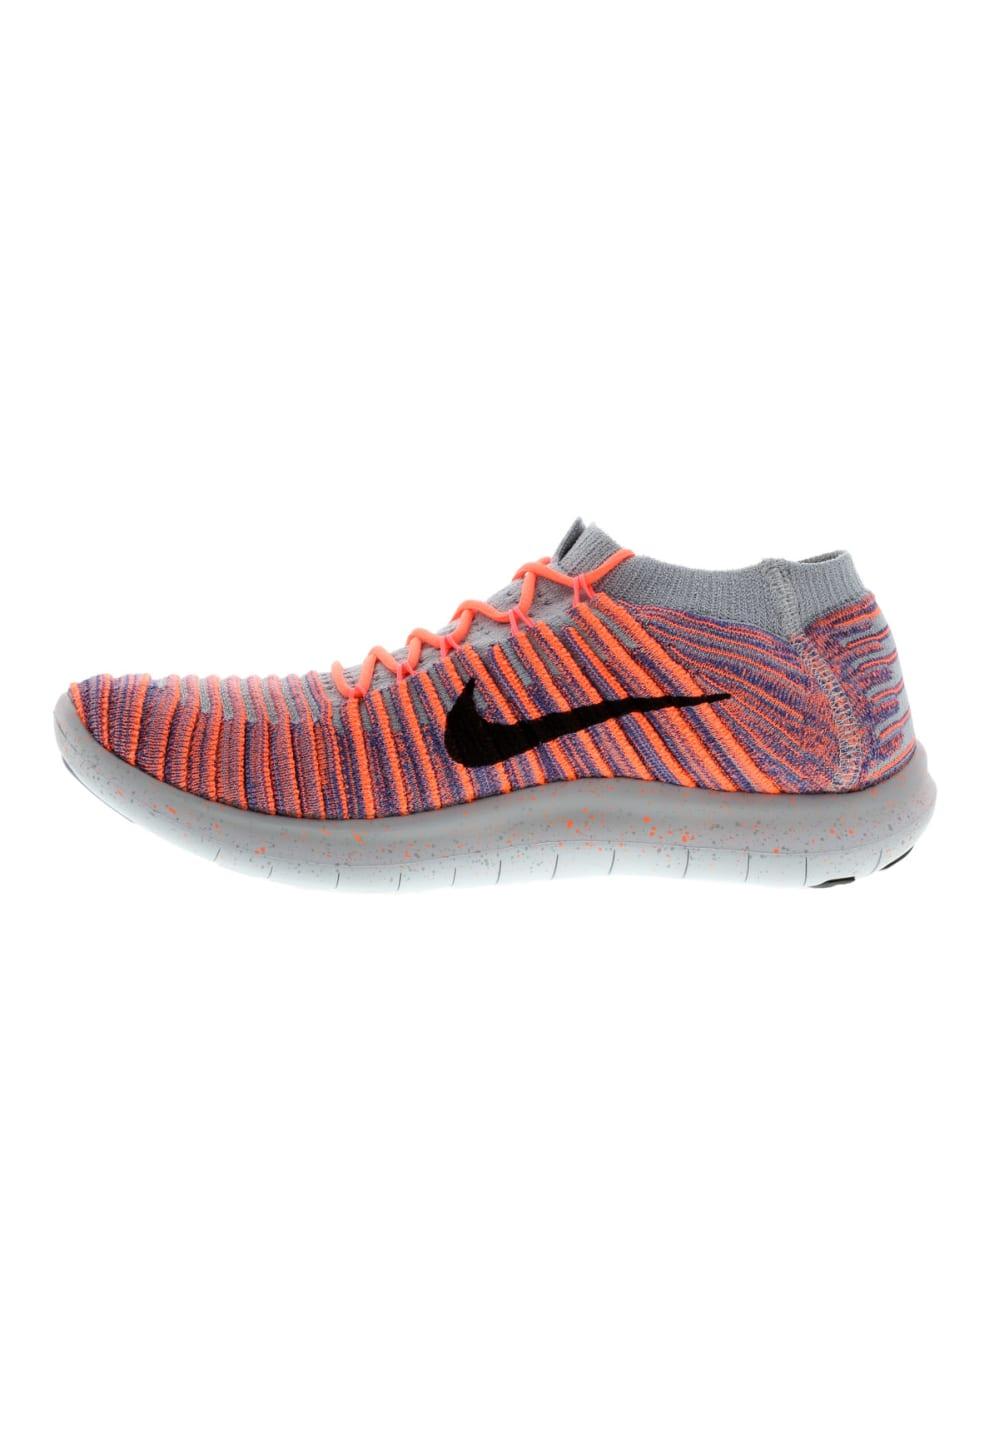 Nike Free RN Motion Flyknit Laufschuhe für Damen Grau